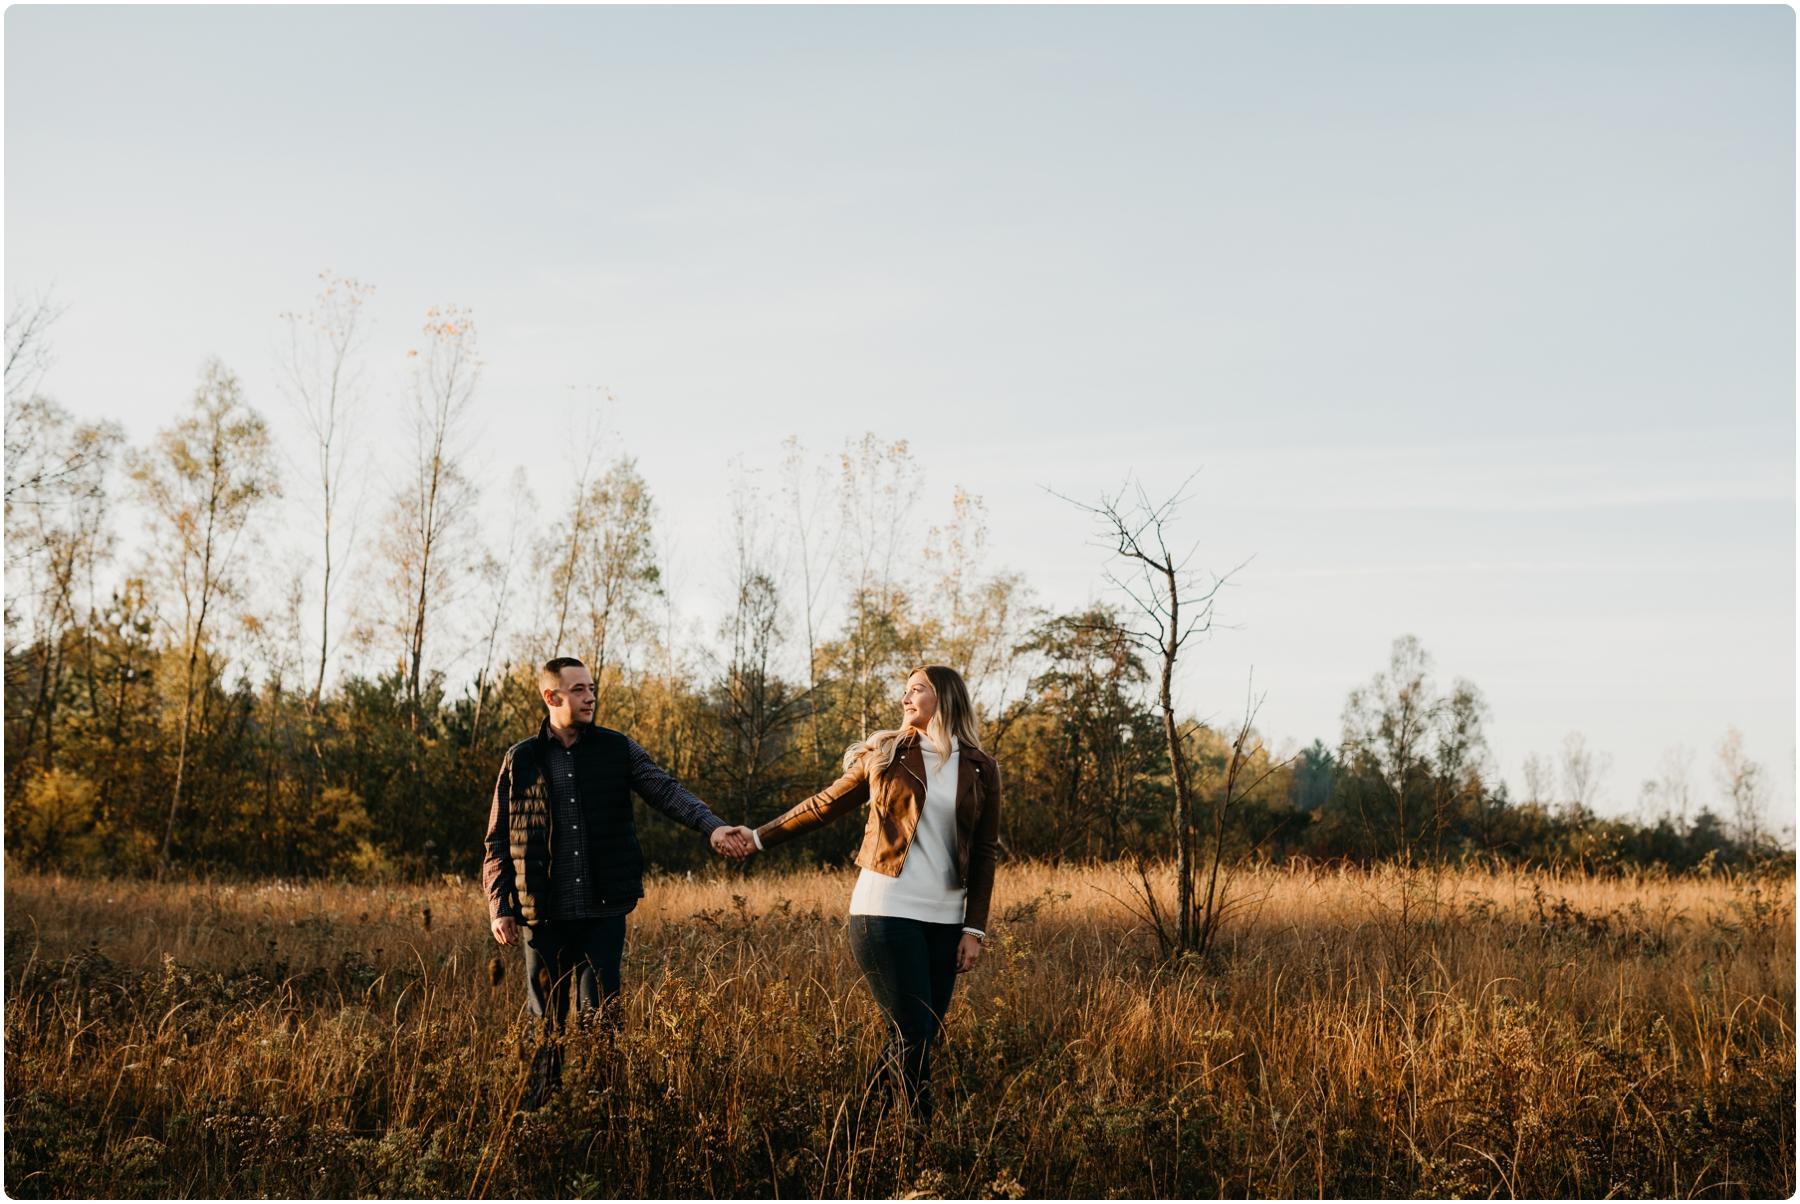 Katerine & Chris Greenwood engagement_0025